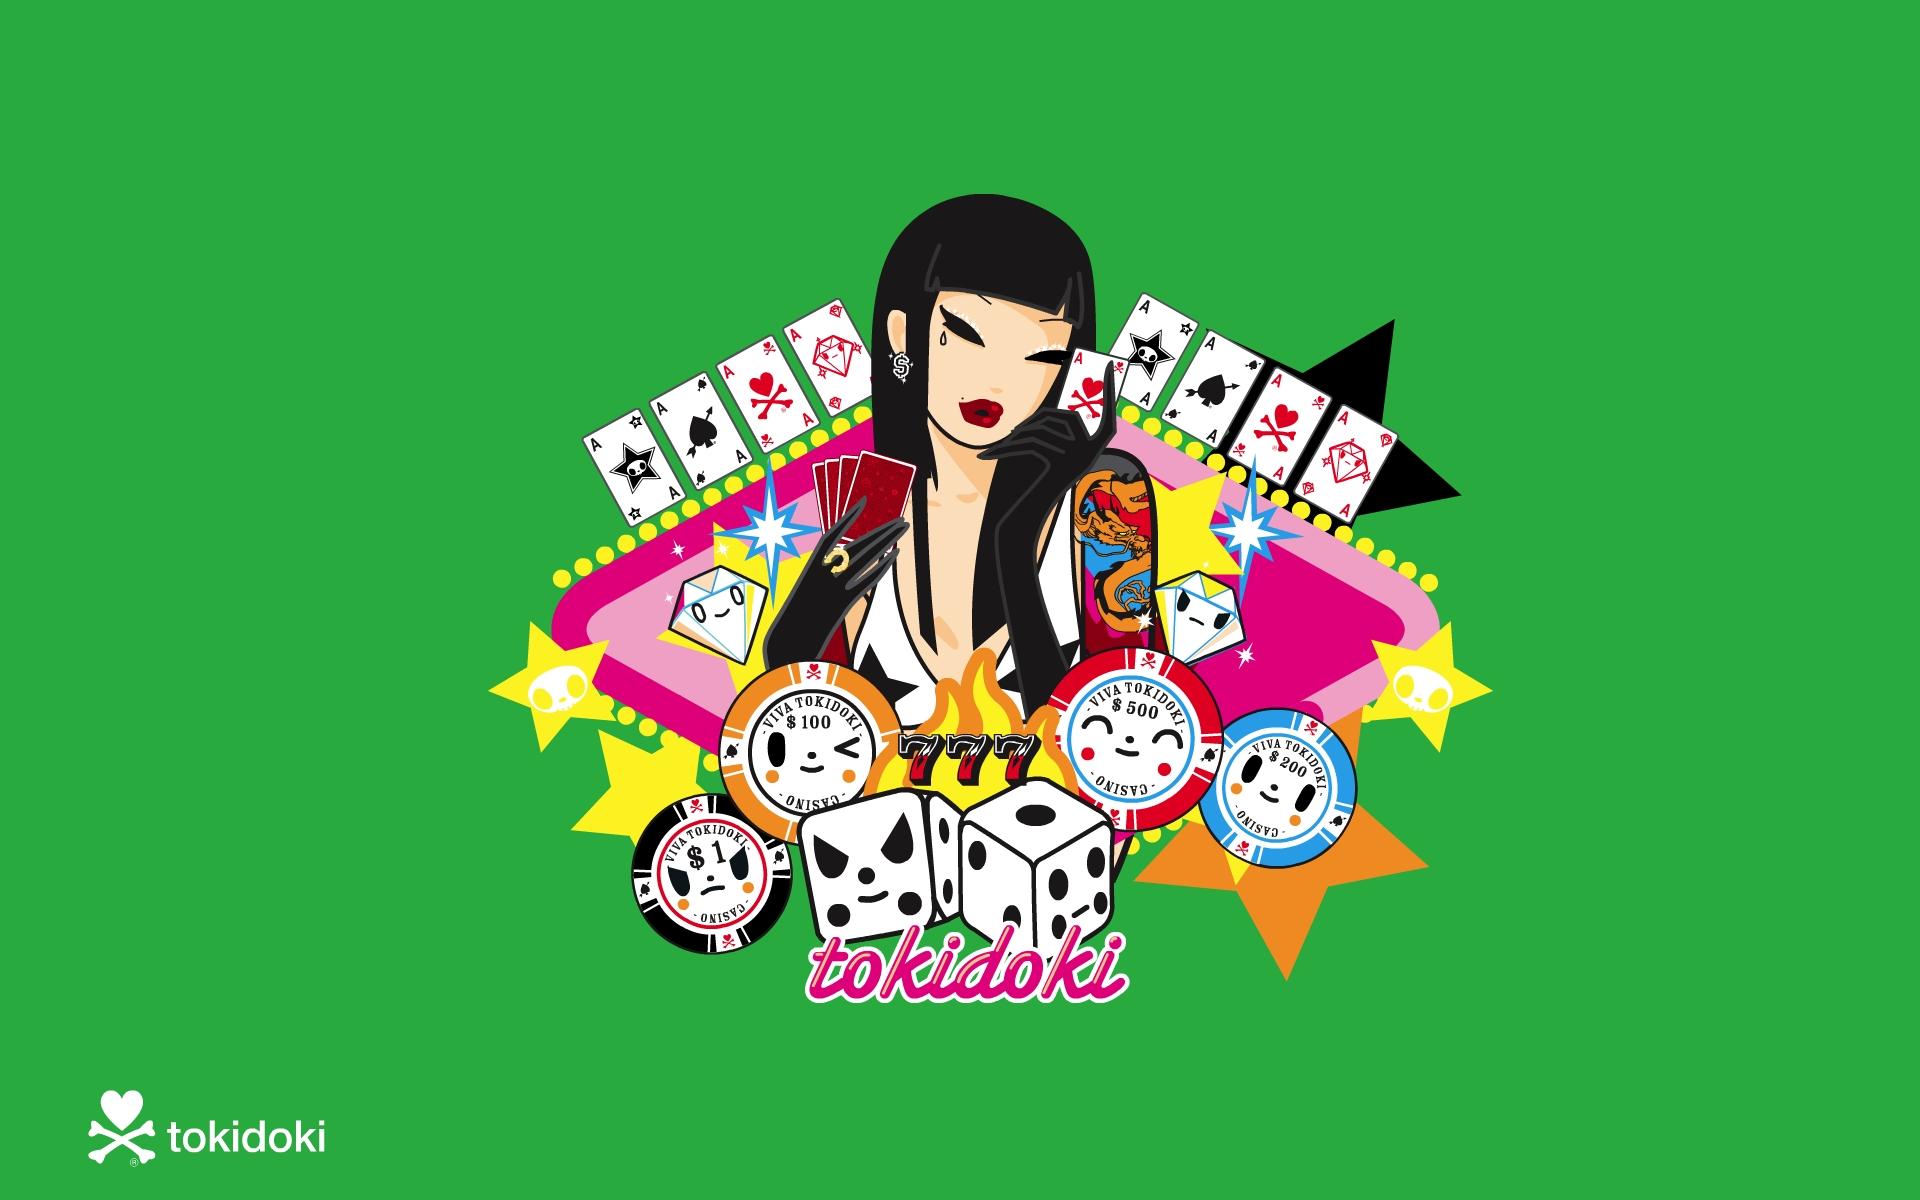 gambling lucky 7 Wallpapers gambling lucky 7 Myspace Backgrounds 1920x1200